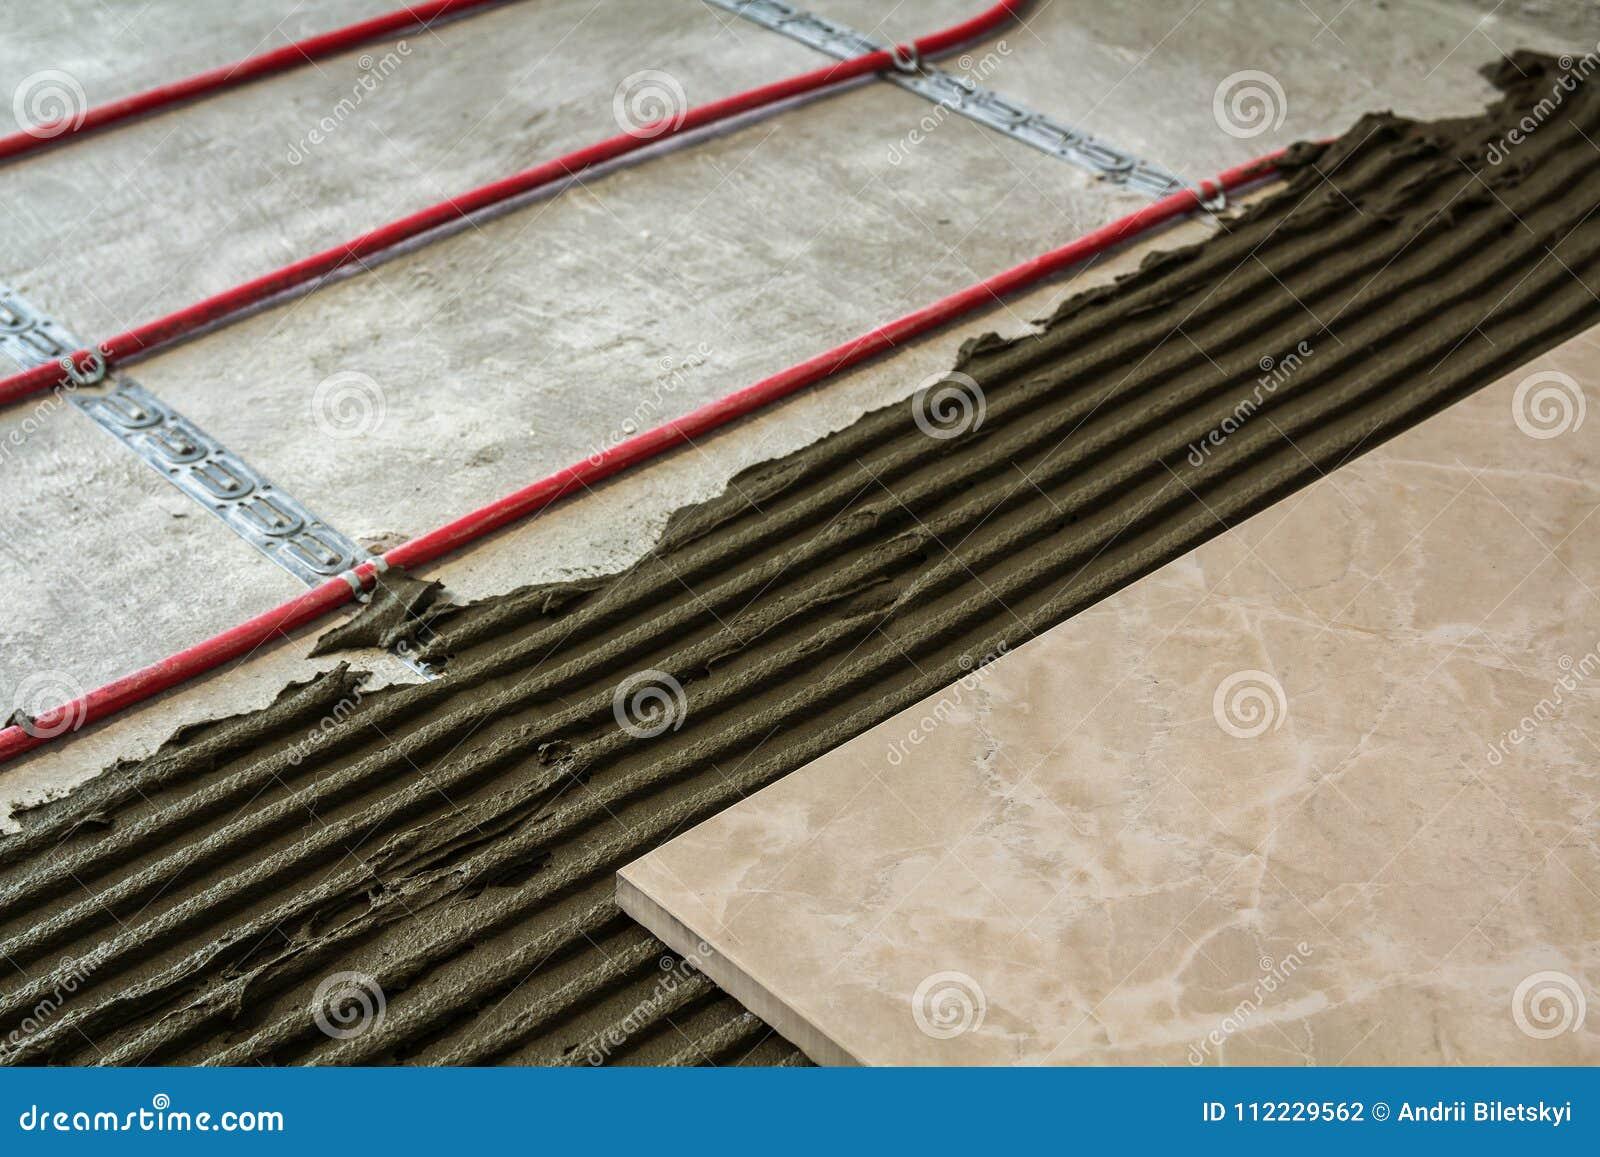 Ceramic Tiles And Tools For Tiler Floor Installation Home Improvement Renovation